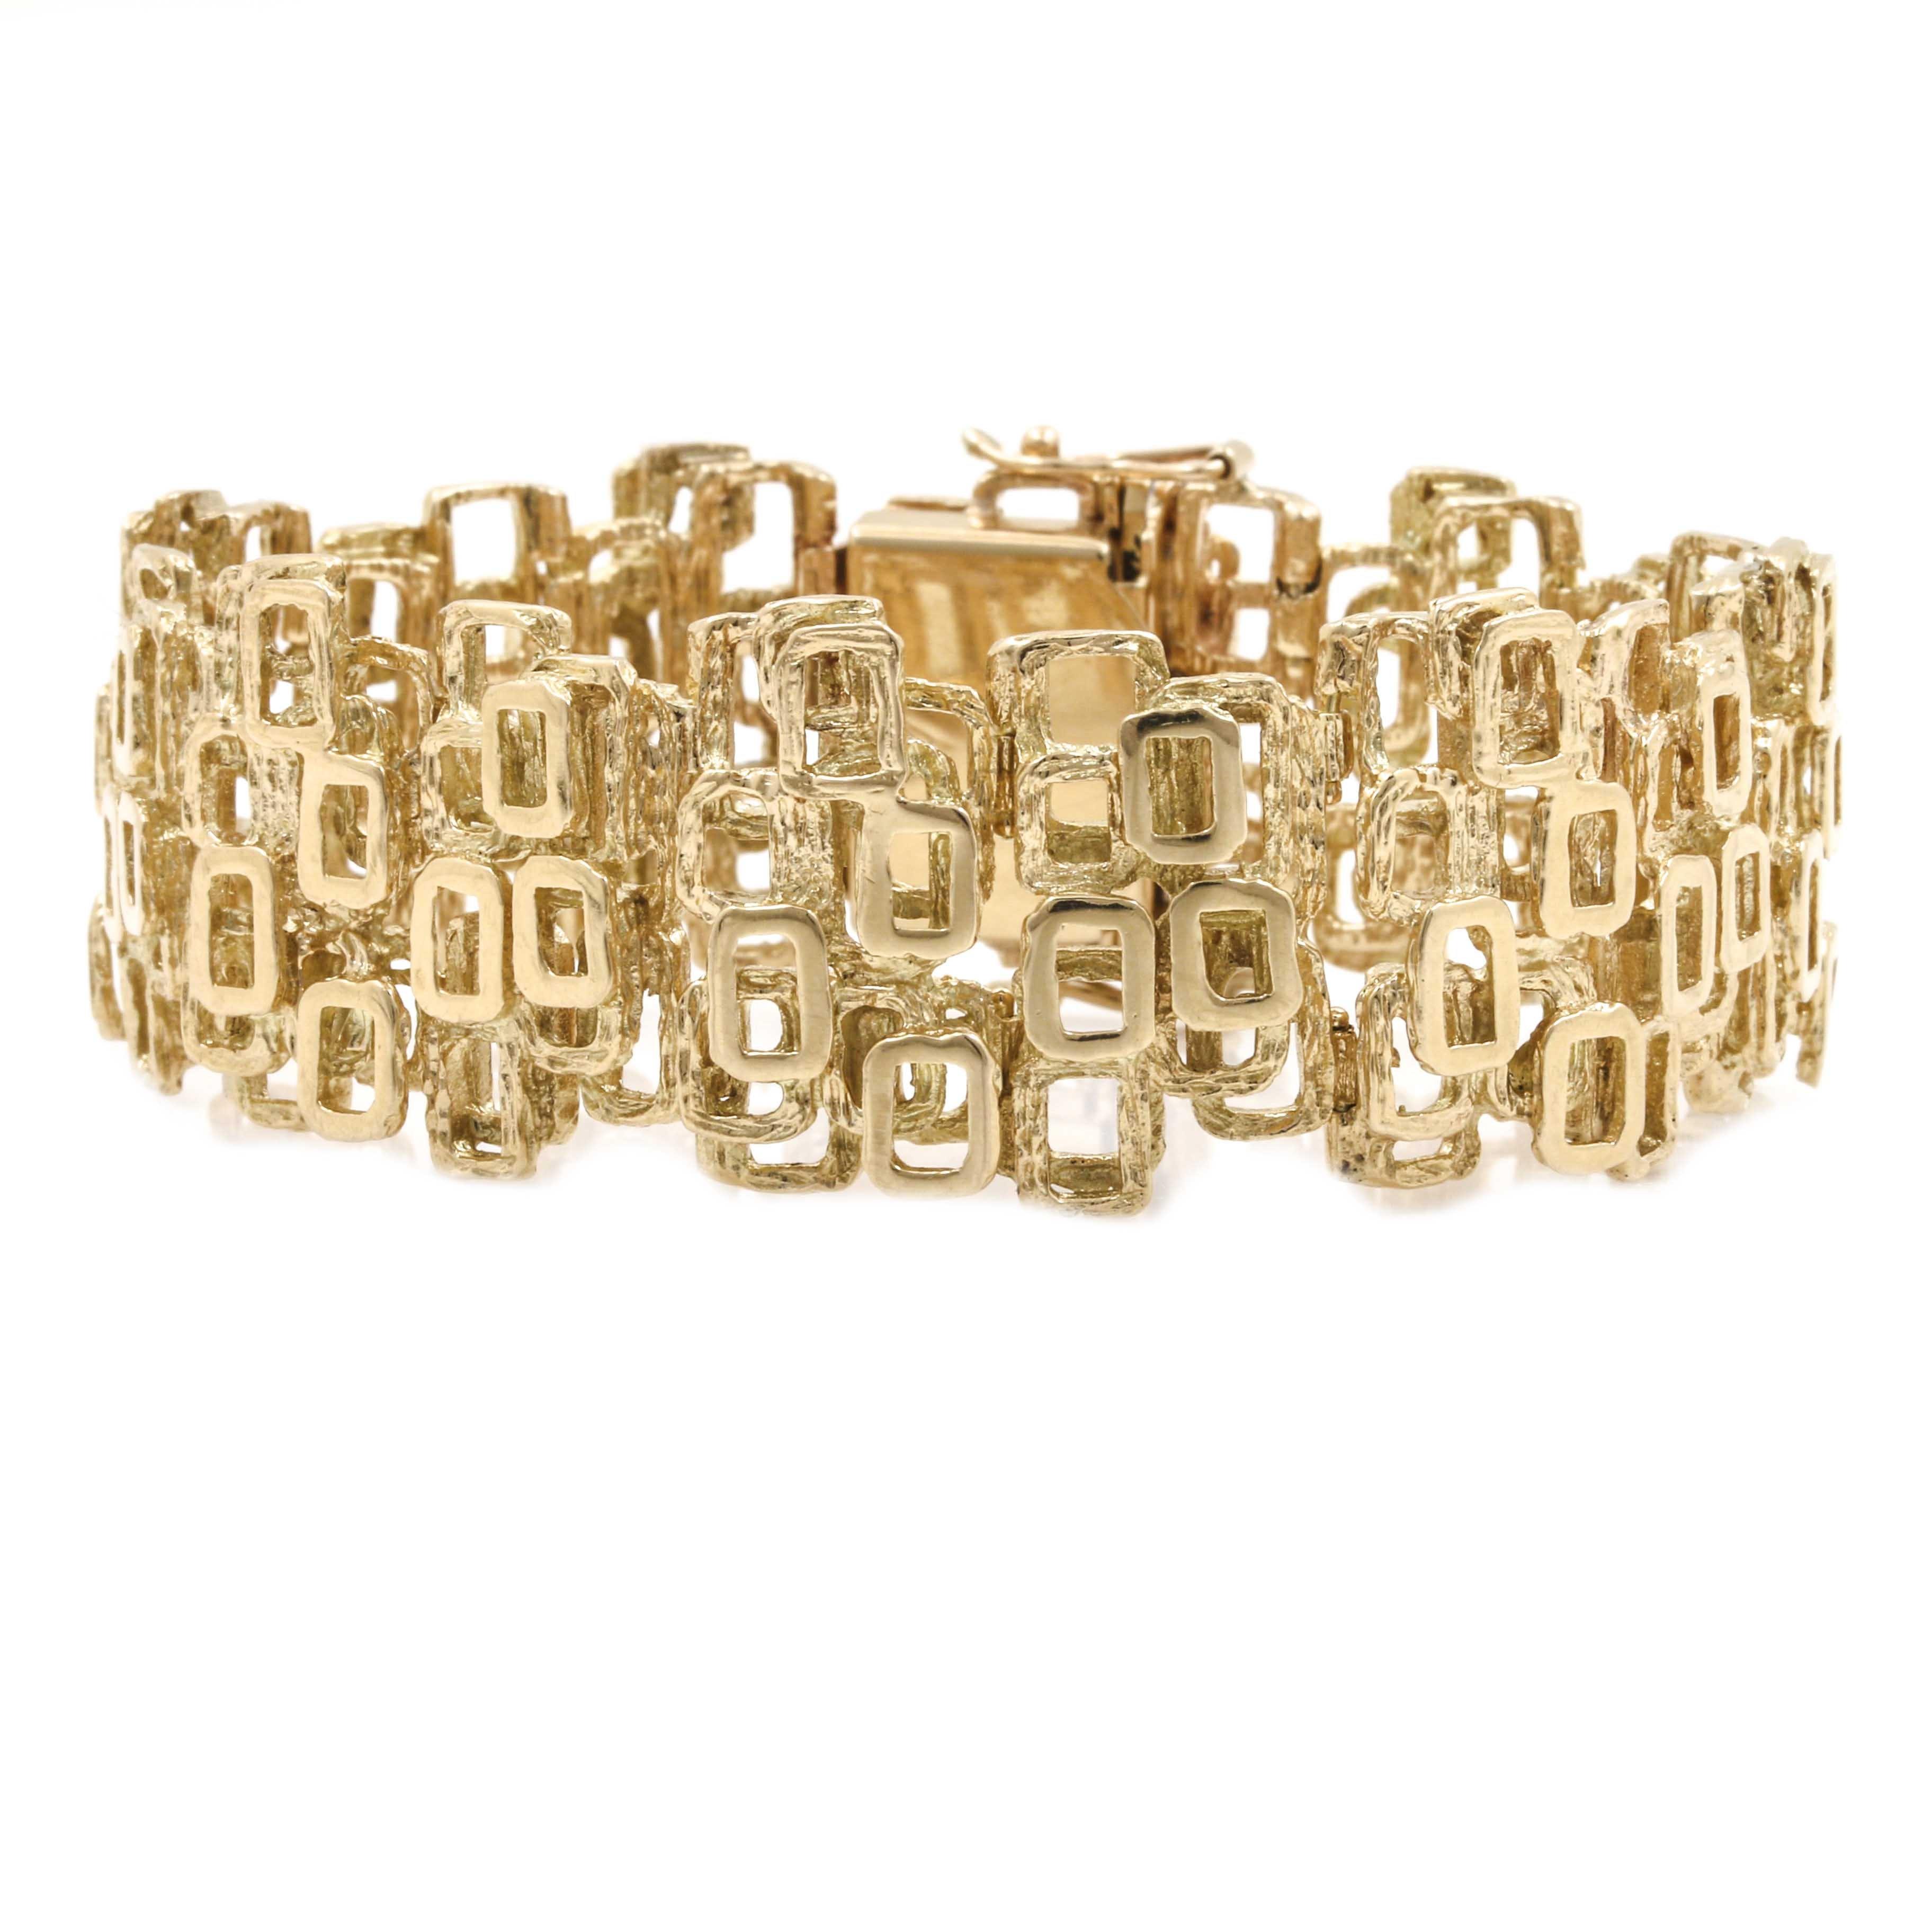 14K Yellow Gold Geometric Hinged Link Bracelet